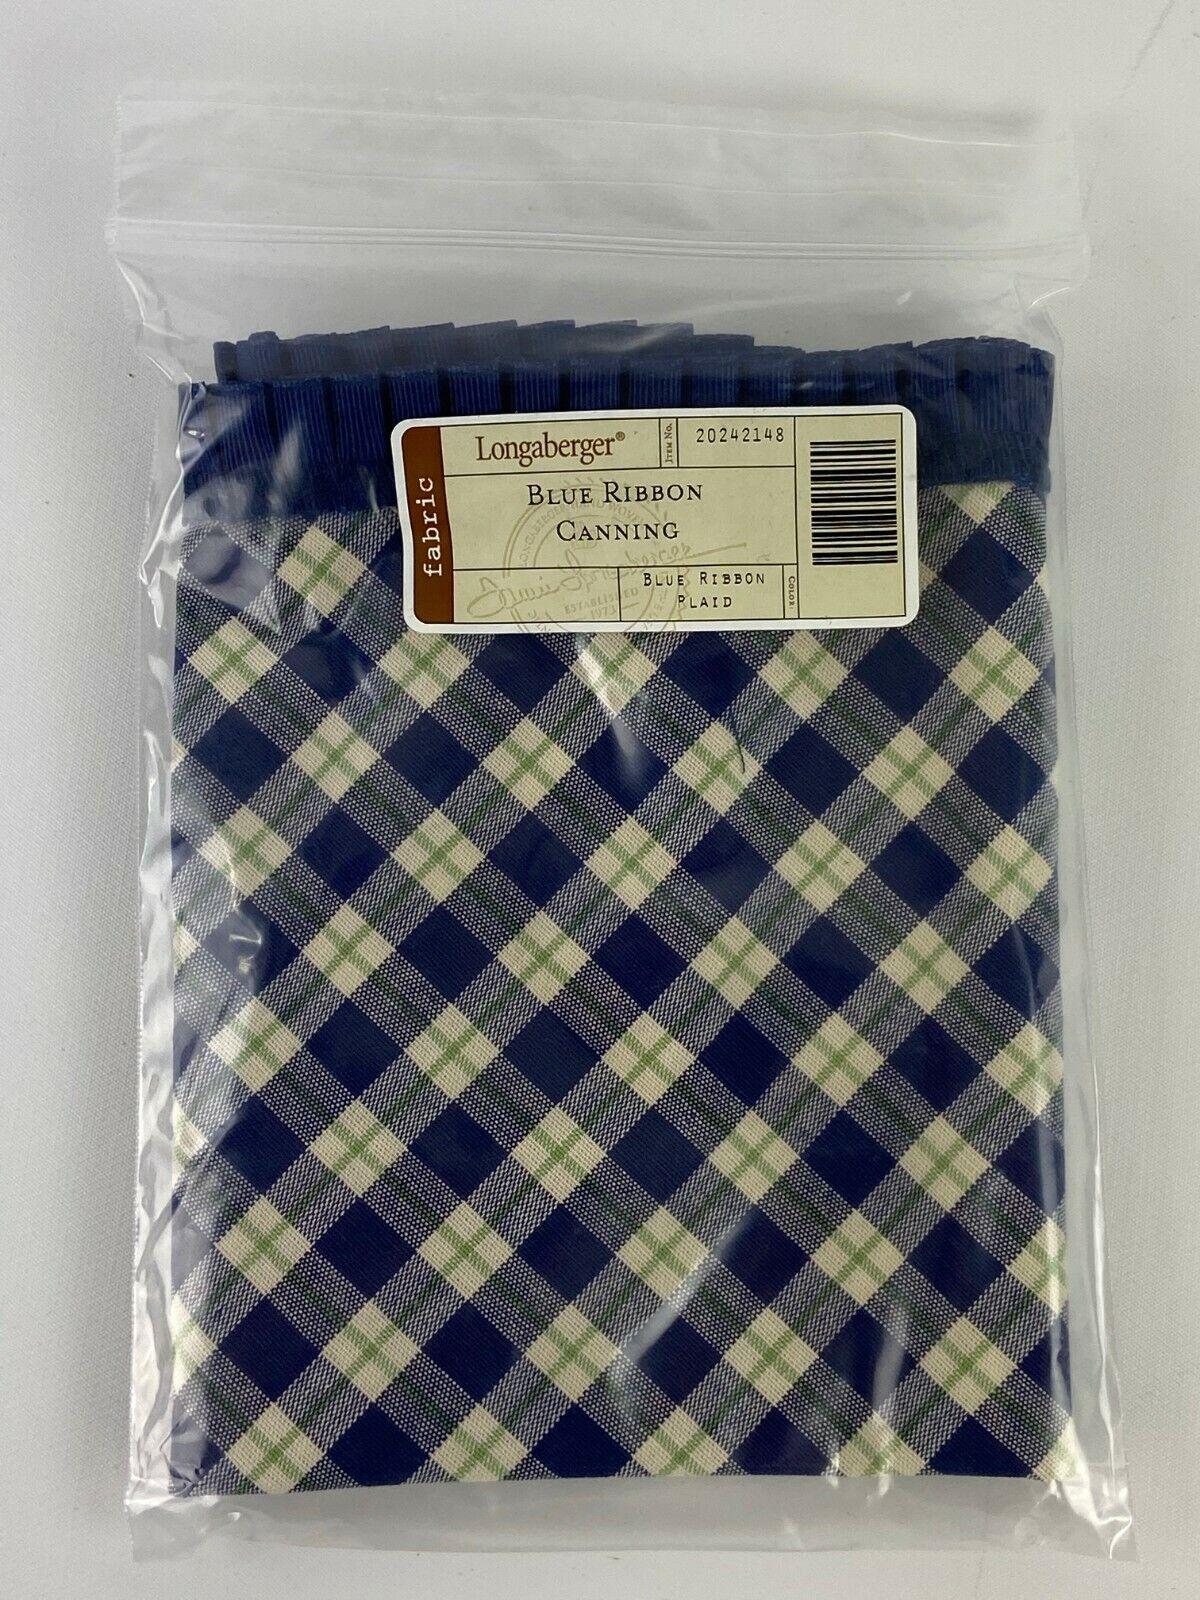 Lot of 5 Longaberger Fabric 20242148 Blue Ribbon Canning Plaid Basket Liner